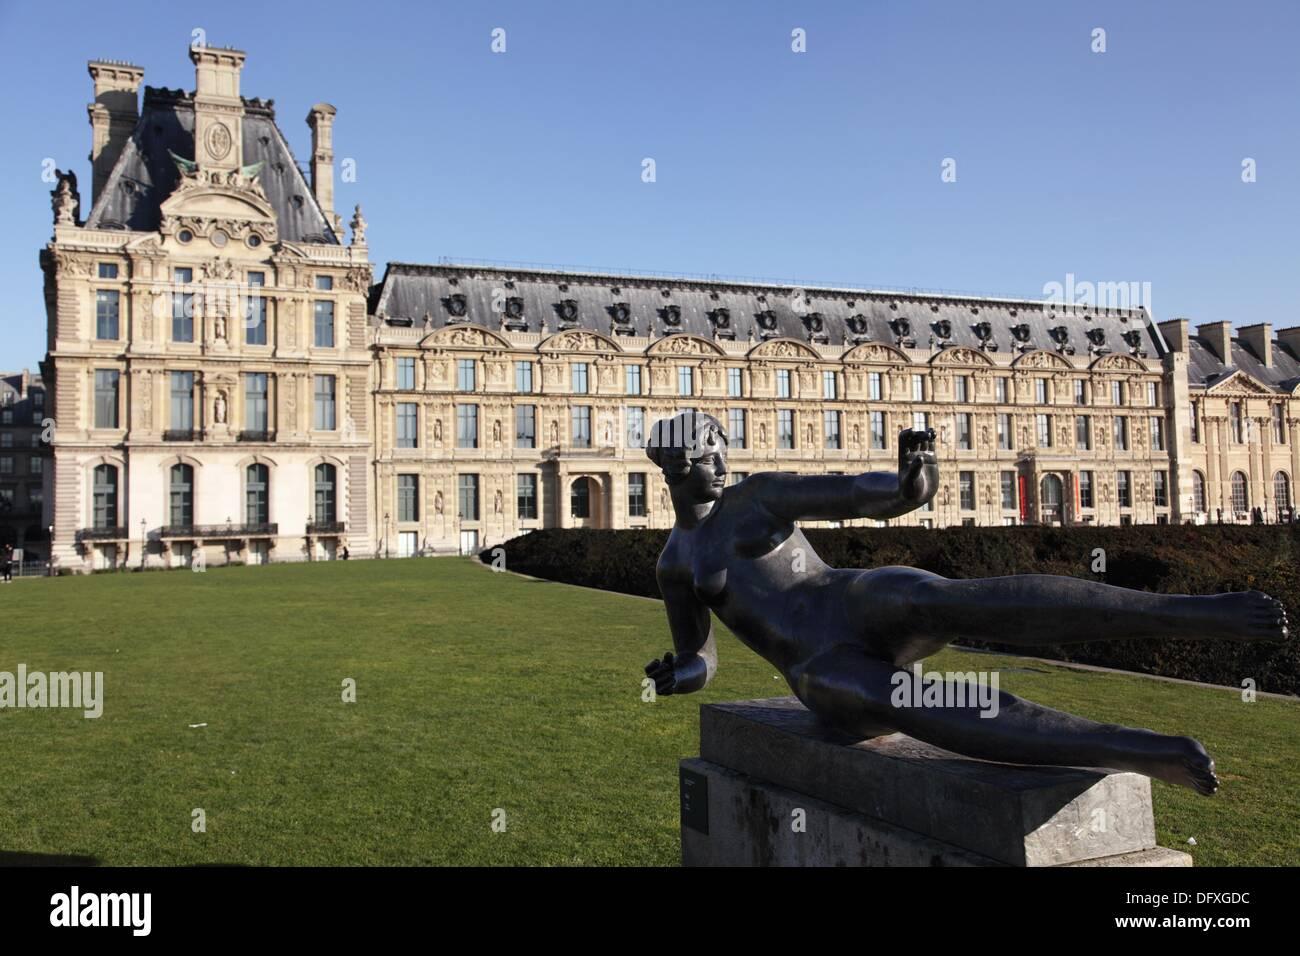 Musee Des Arts Decoratifs Paris Stock Photos & Musee Des Arts ...